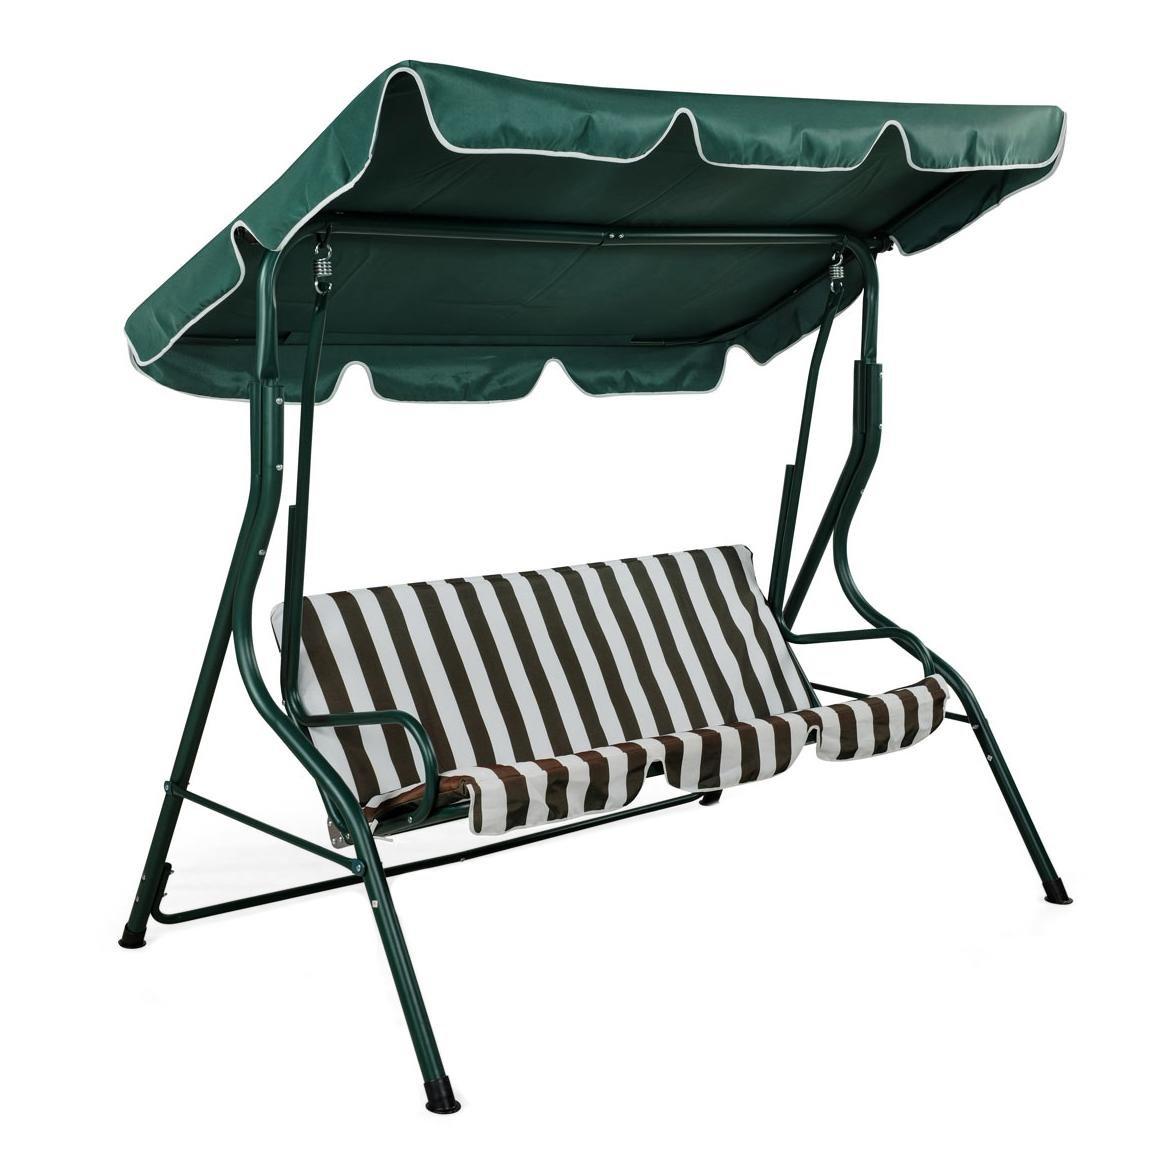 Oypla Luxury Garden Swing Bench Chair Hammock: Amazon.co.uk: Garden U0026  Outdoors Part 76